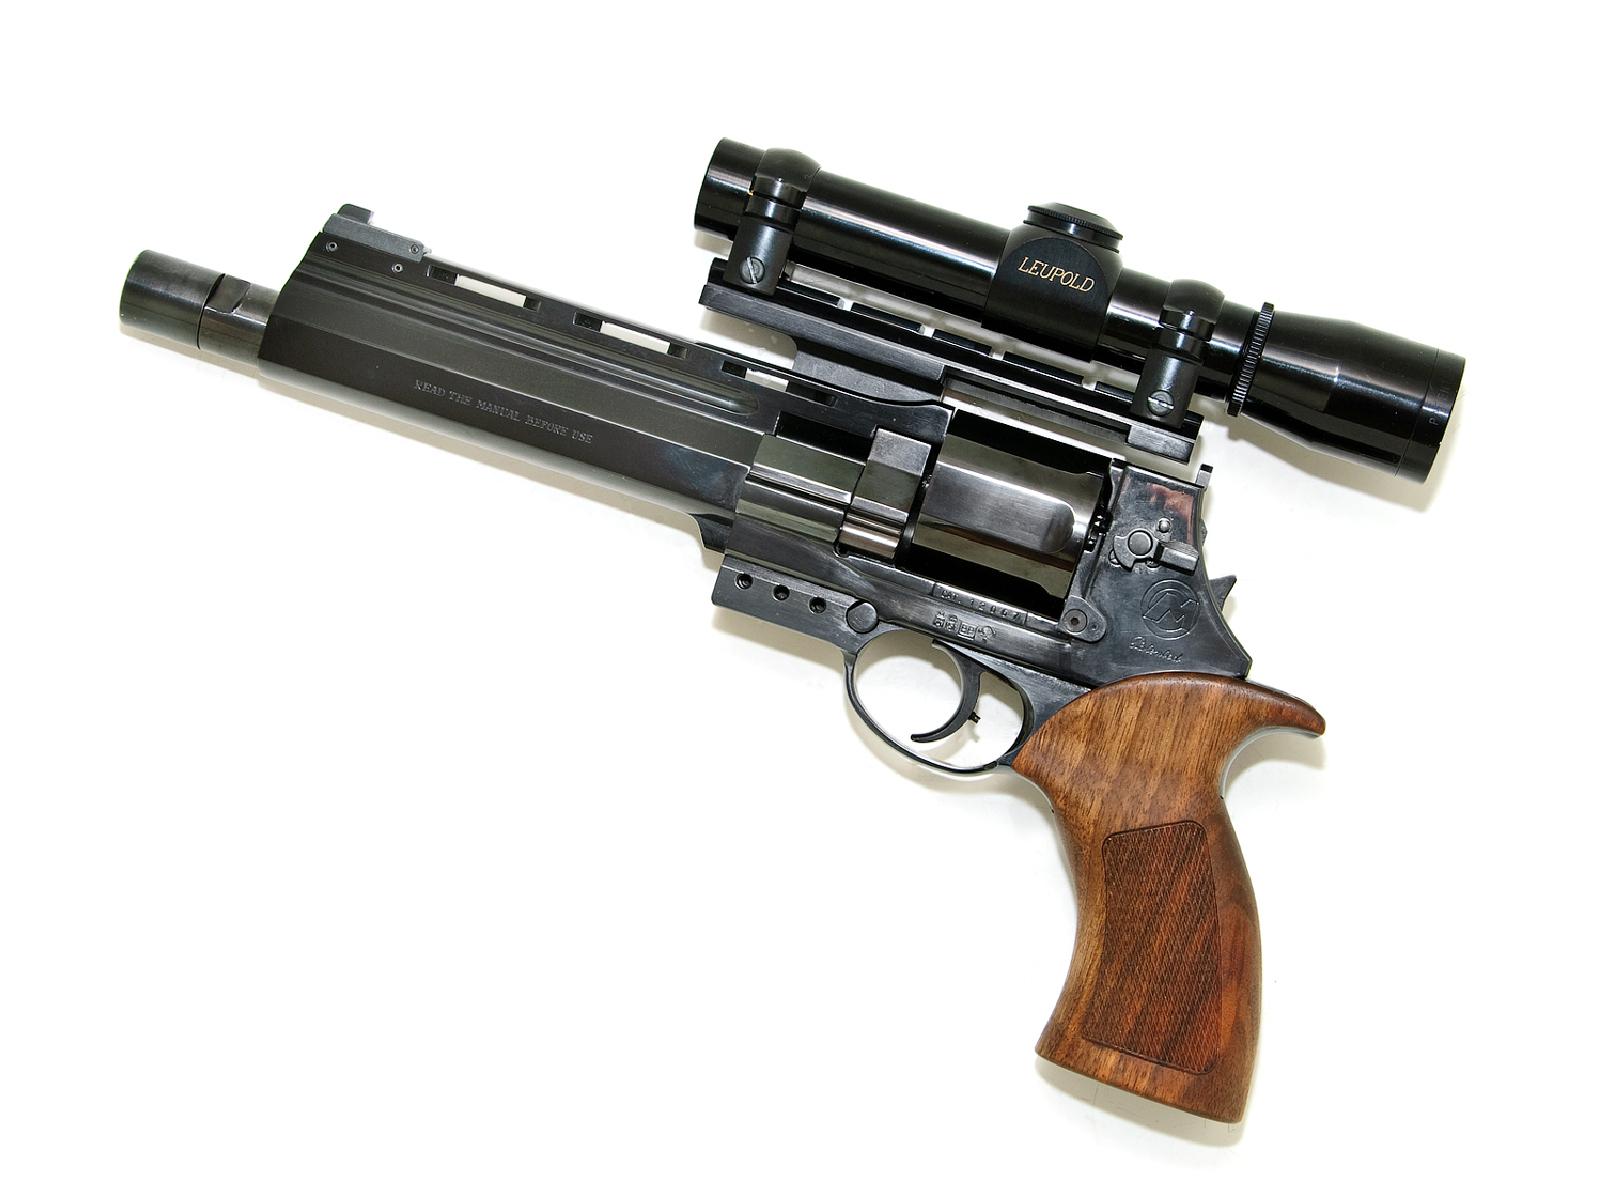 Mateba Unica Revolver Pics, Weapons Collection